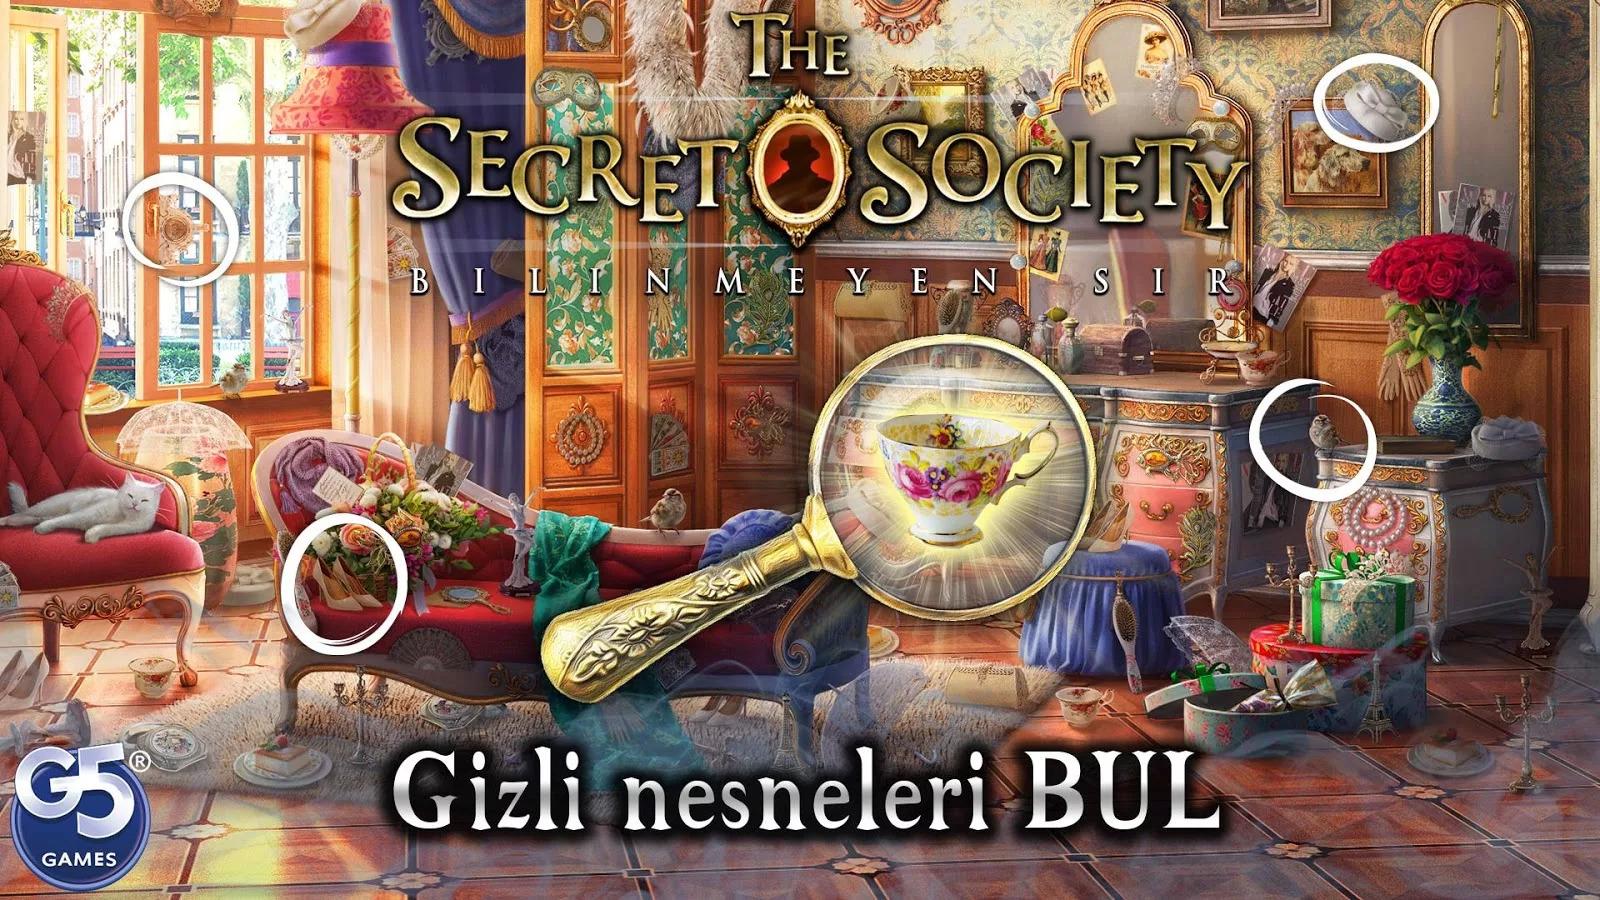 The Secret Society: Bilinmeyen Sır Apk Mod